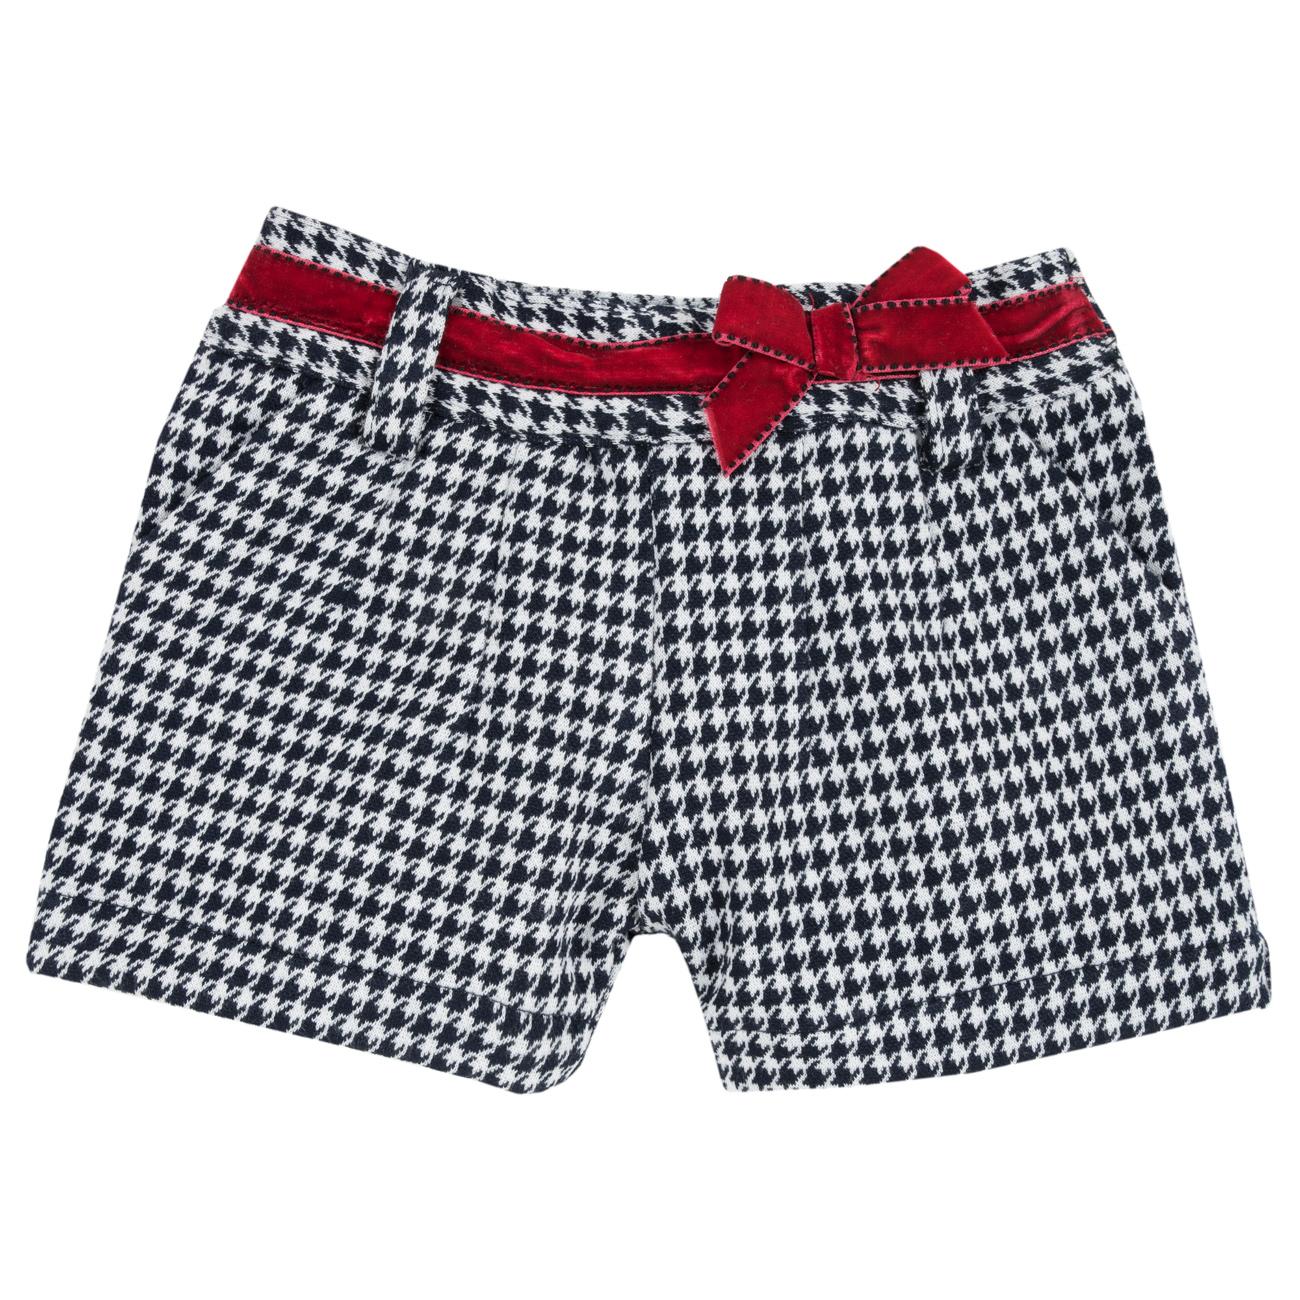 Pantaloni copii Chicco, alb, 52717